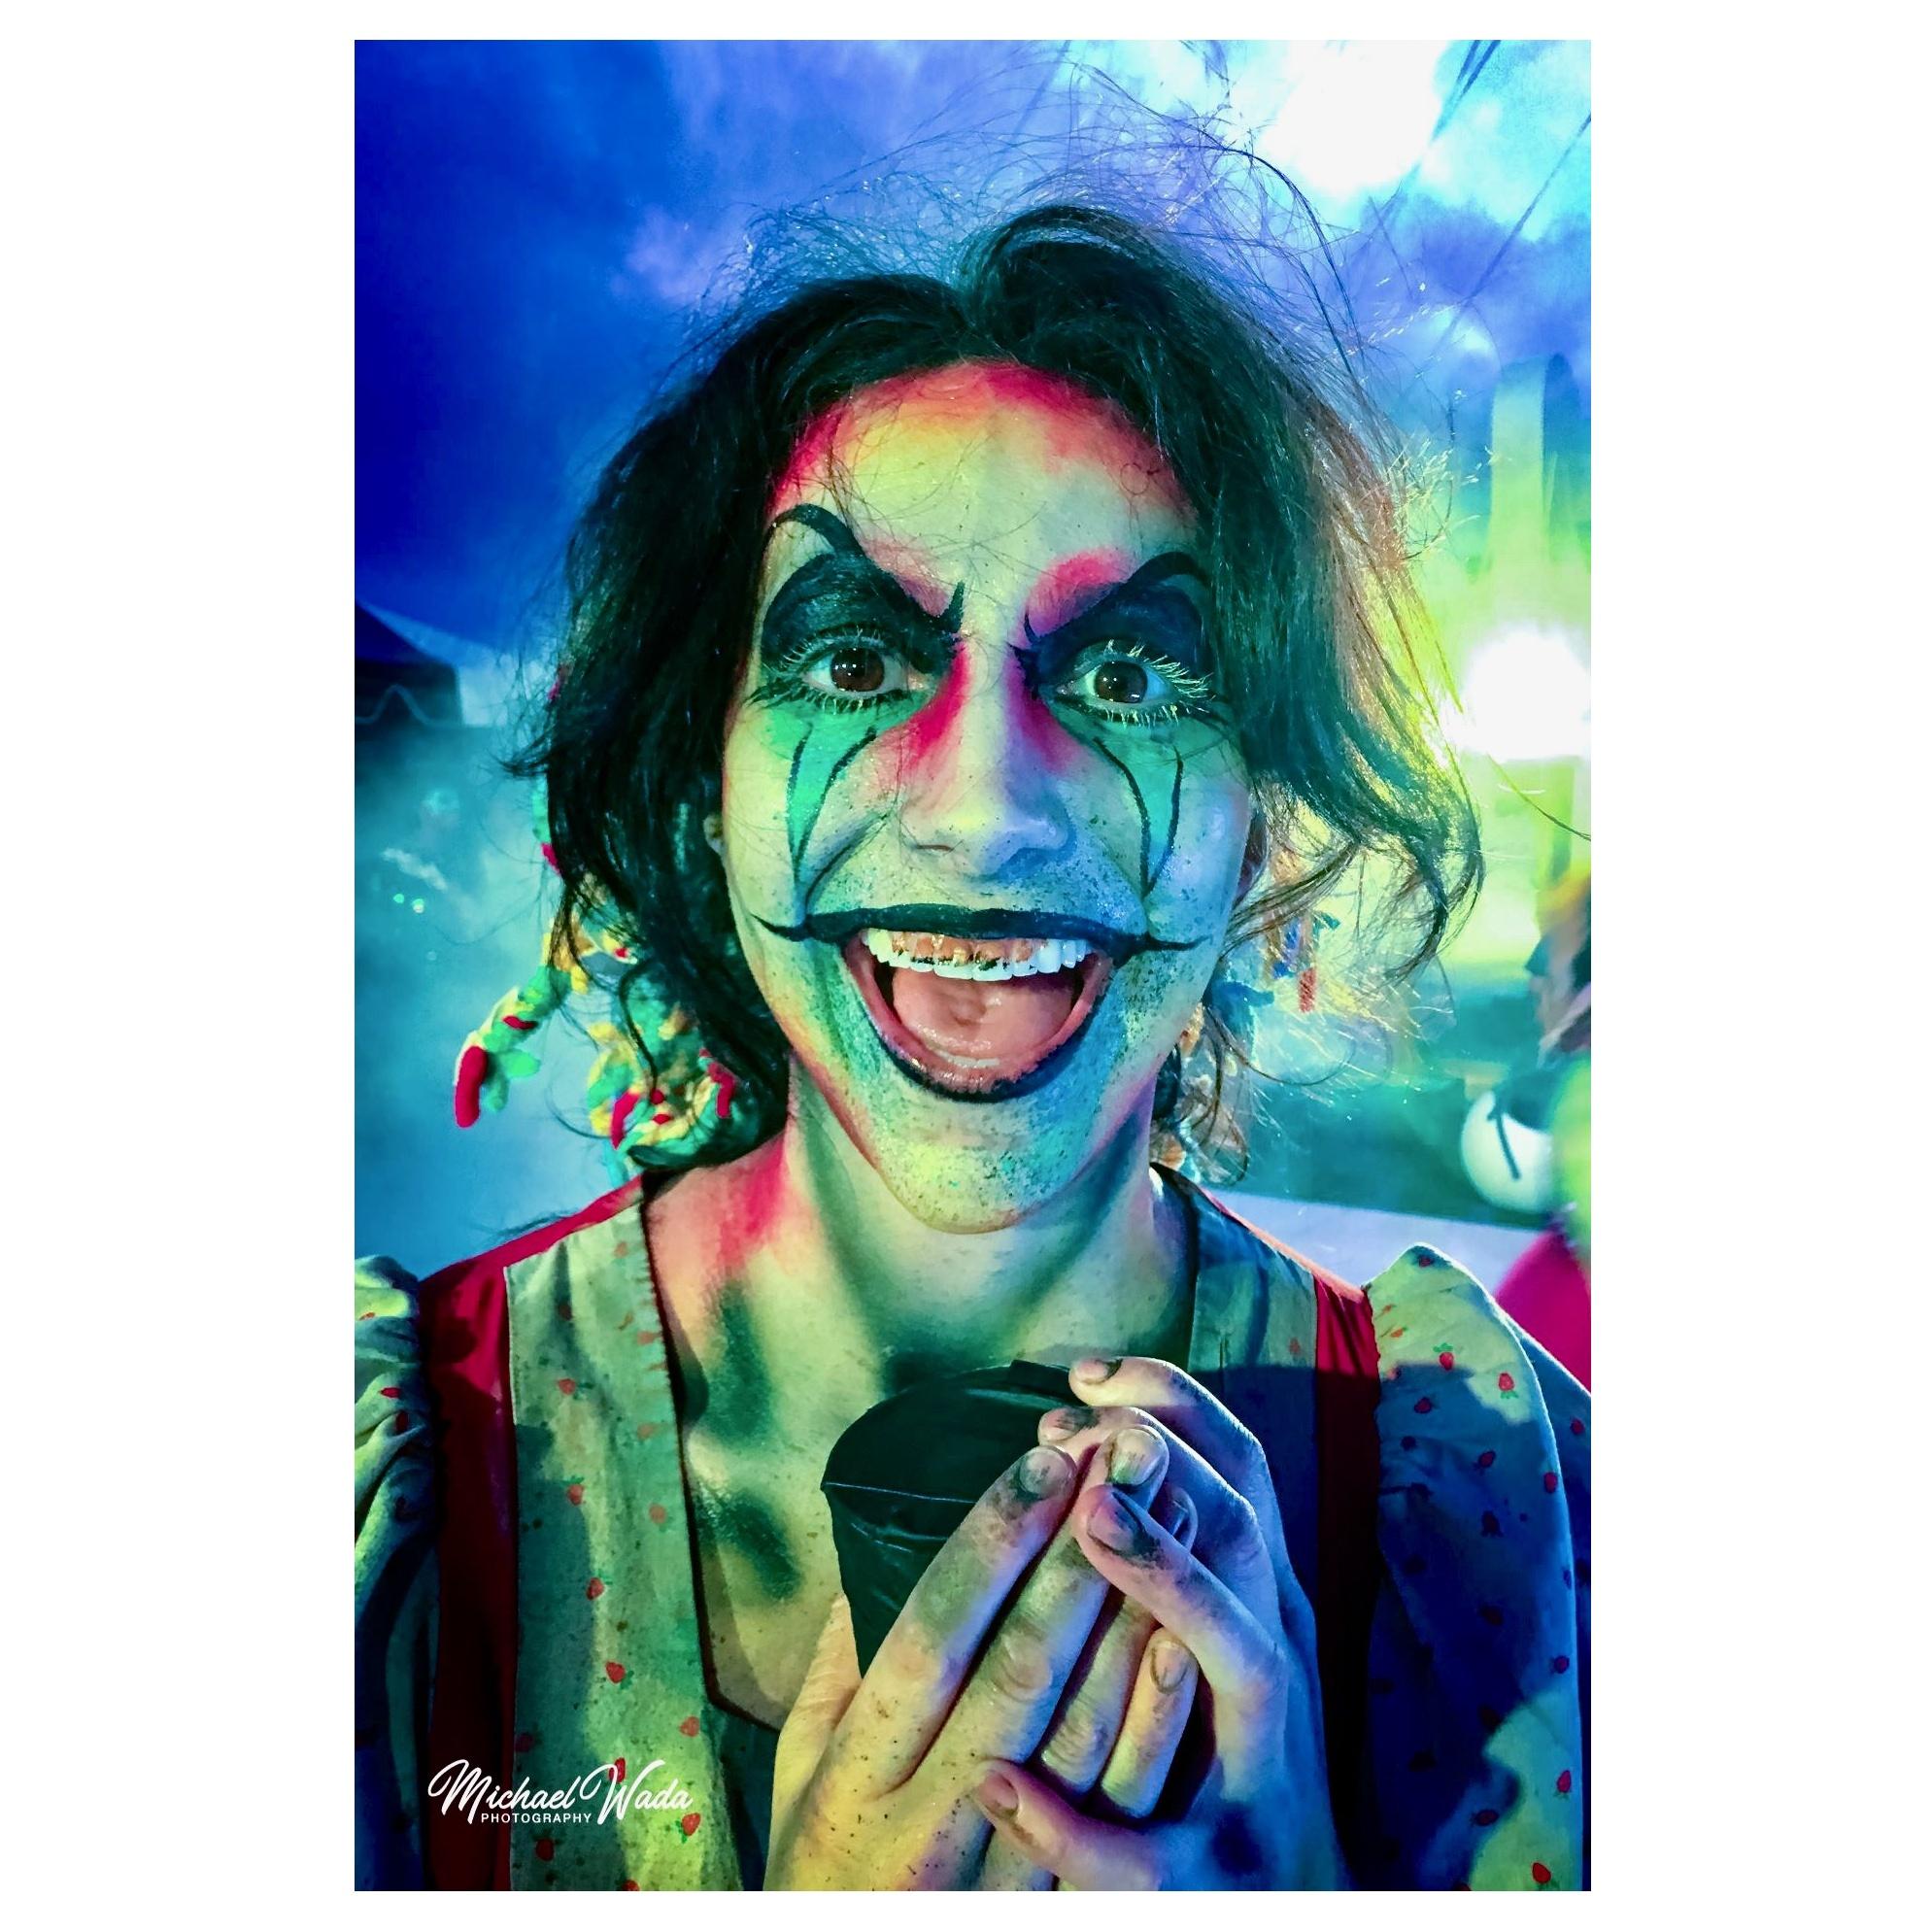 Adrienne_Whitney_Papp_Sinister_Circus_Midsummer_Scream_2017_Queen_Mary_Dark_Harbor_1.jpeg